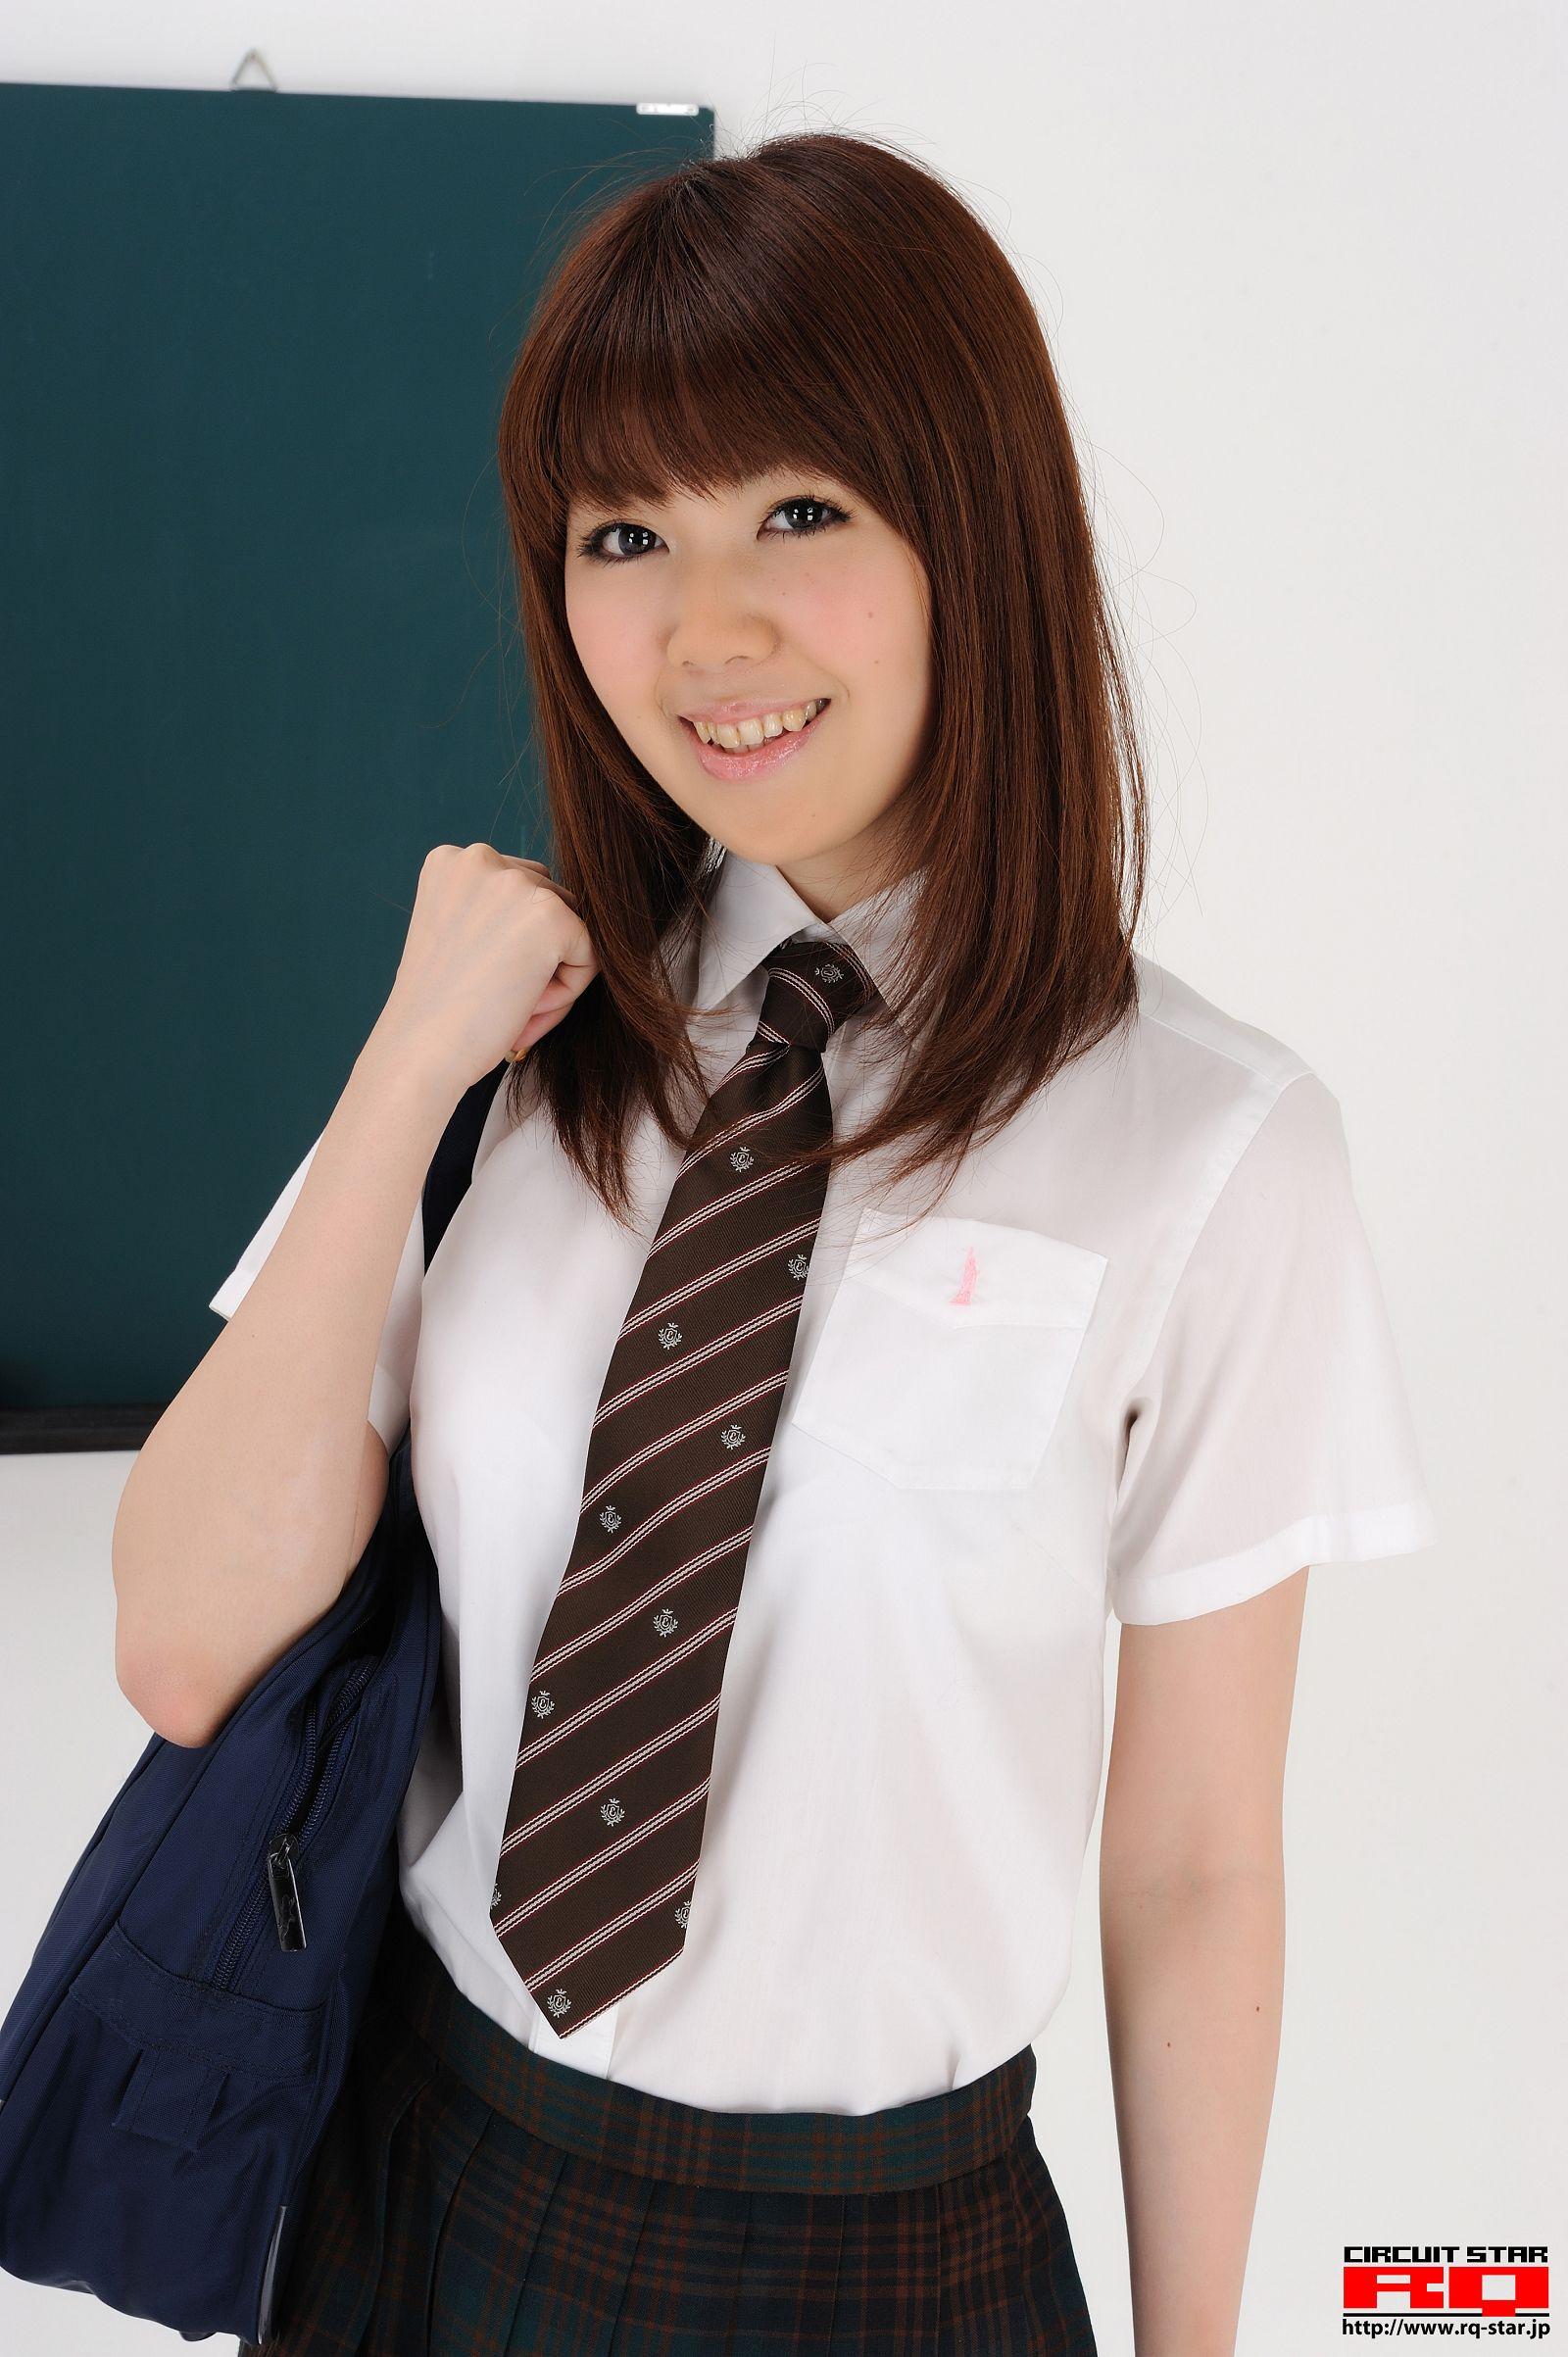 [RQ STAR美女] NO.0378 Haruka Ikuta 生田晴香 School Girl[119P] RQ STAR 第2张